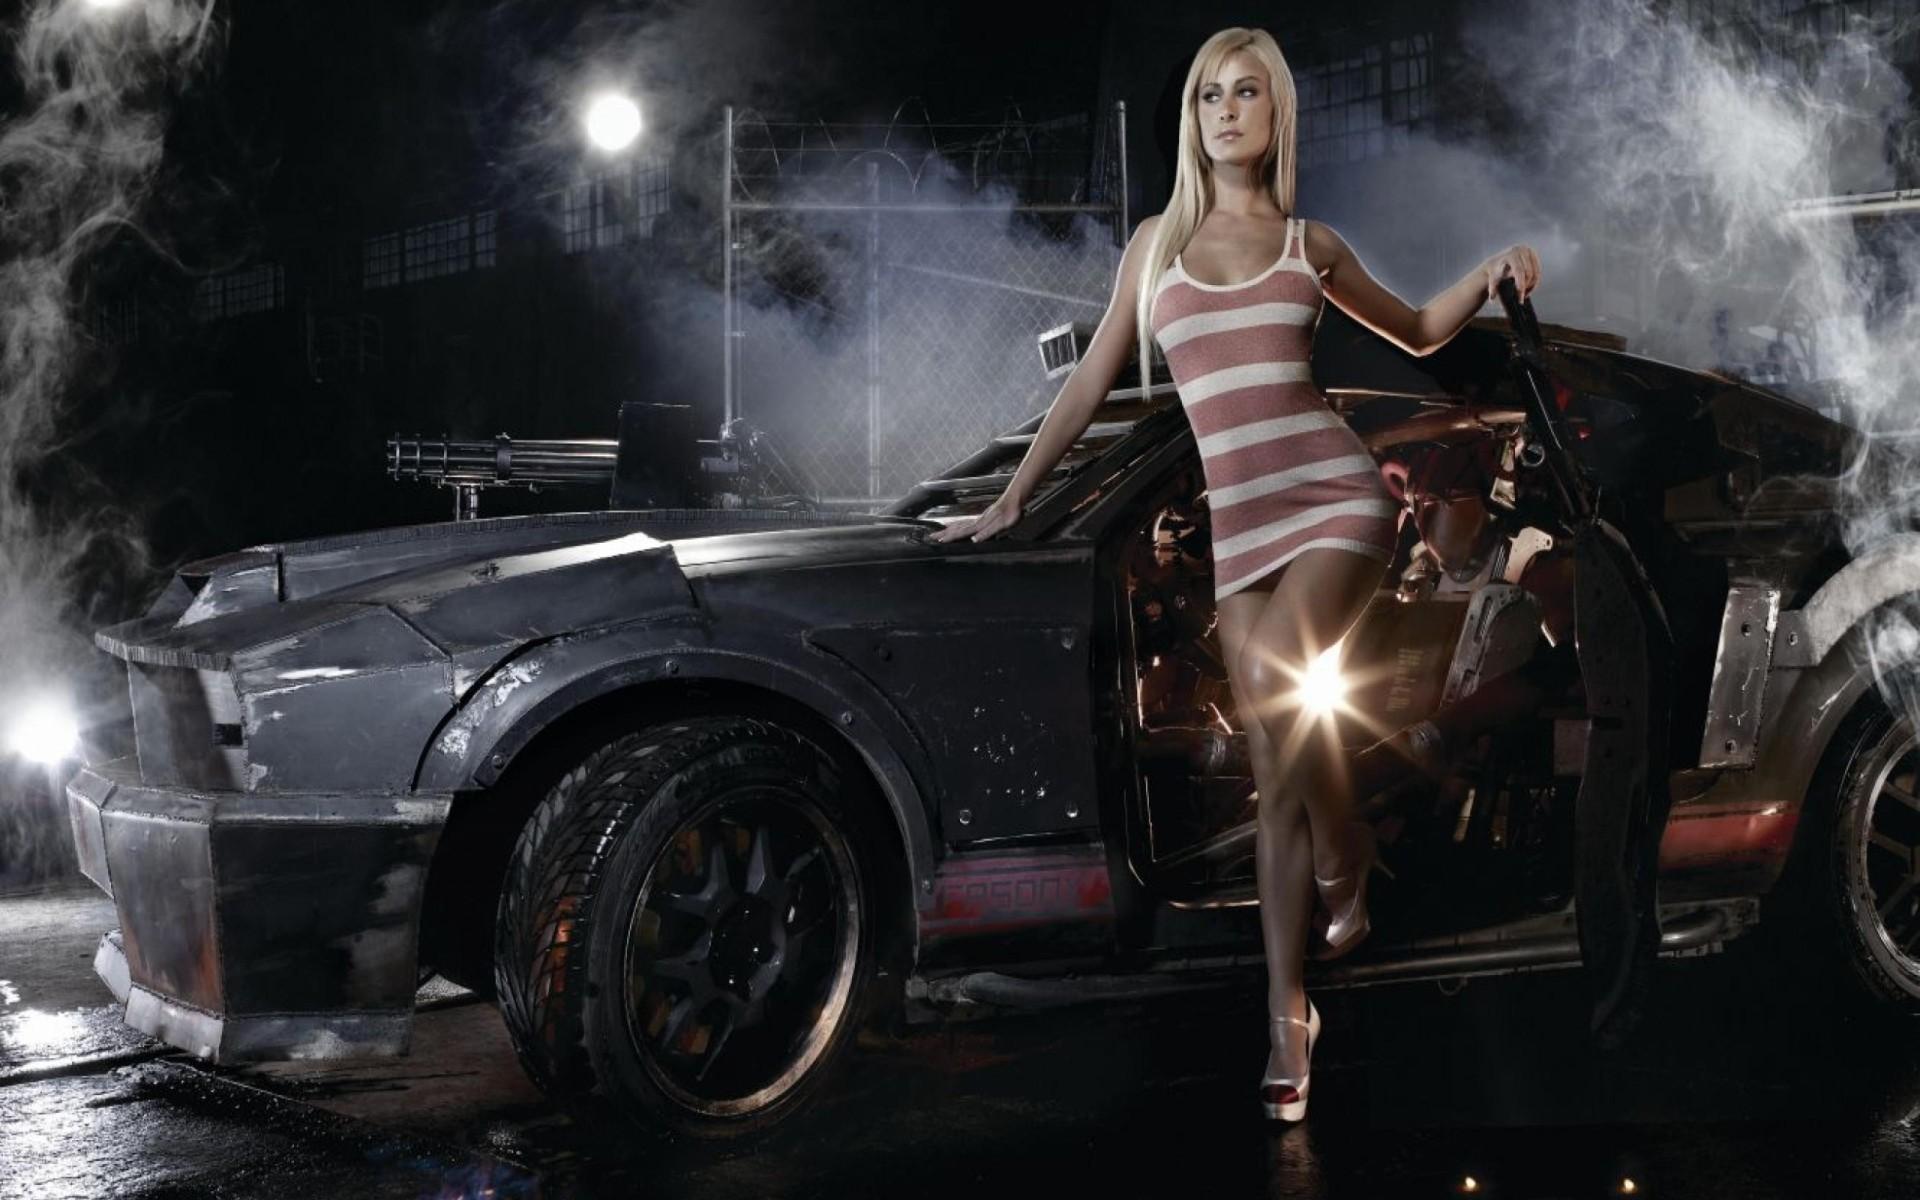 Girl car hd wallpaper